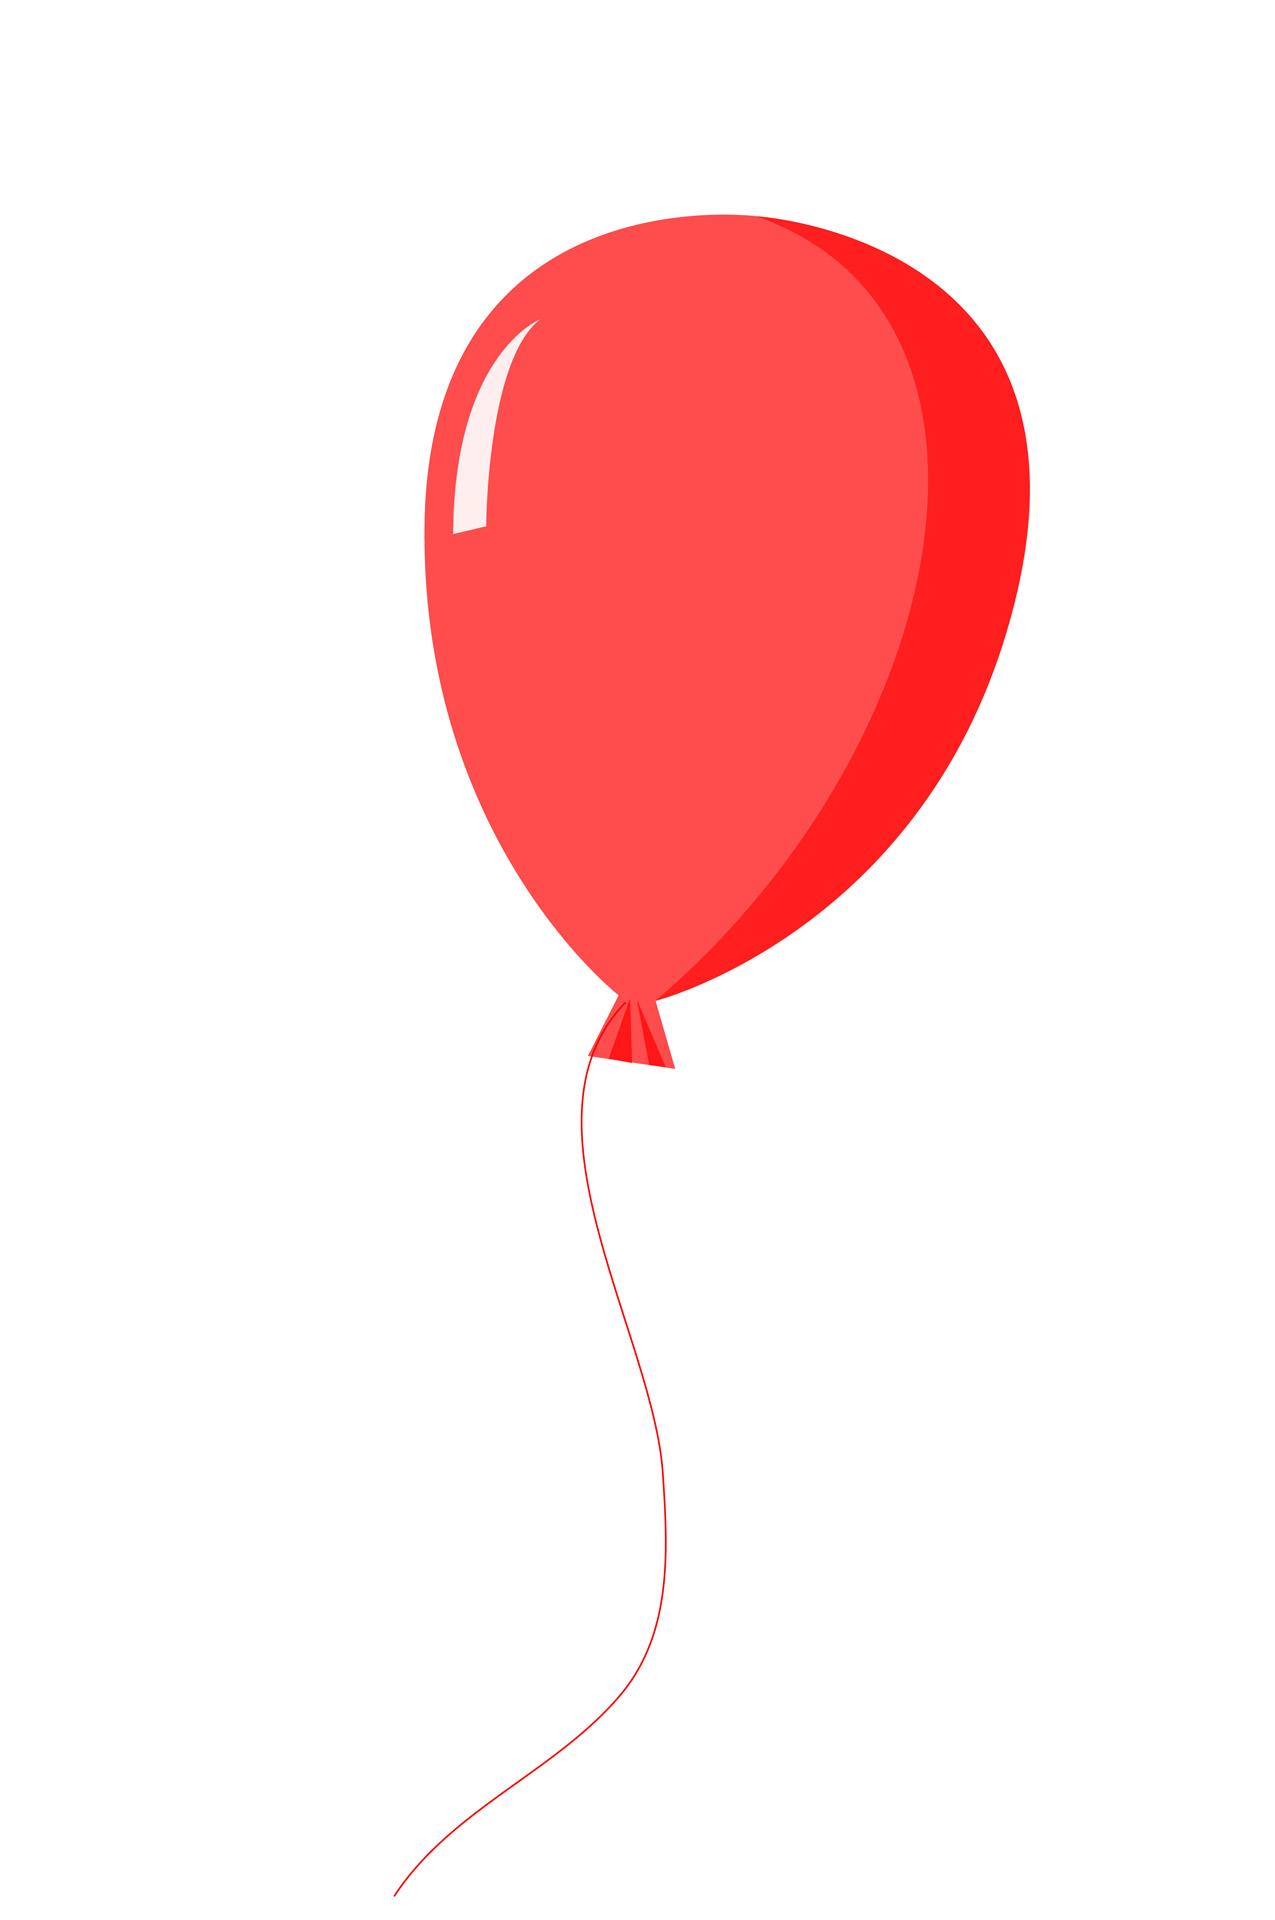 Clip art balloons clipart on .